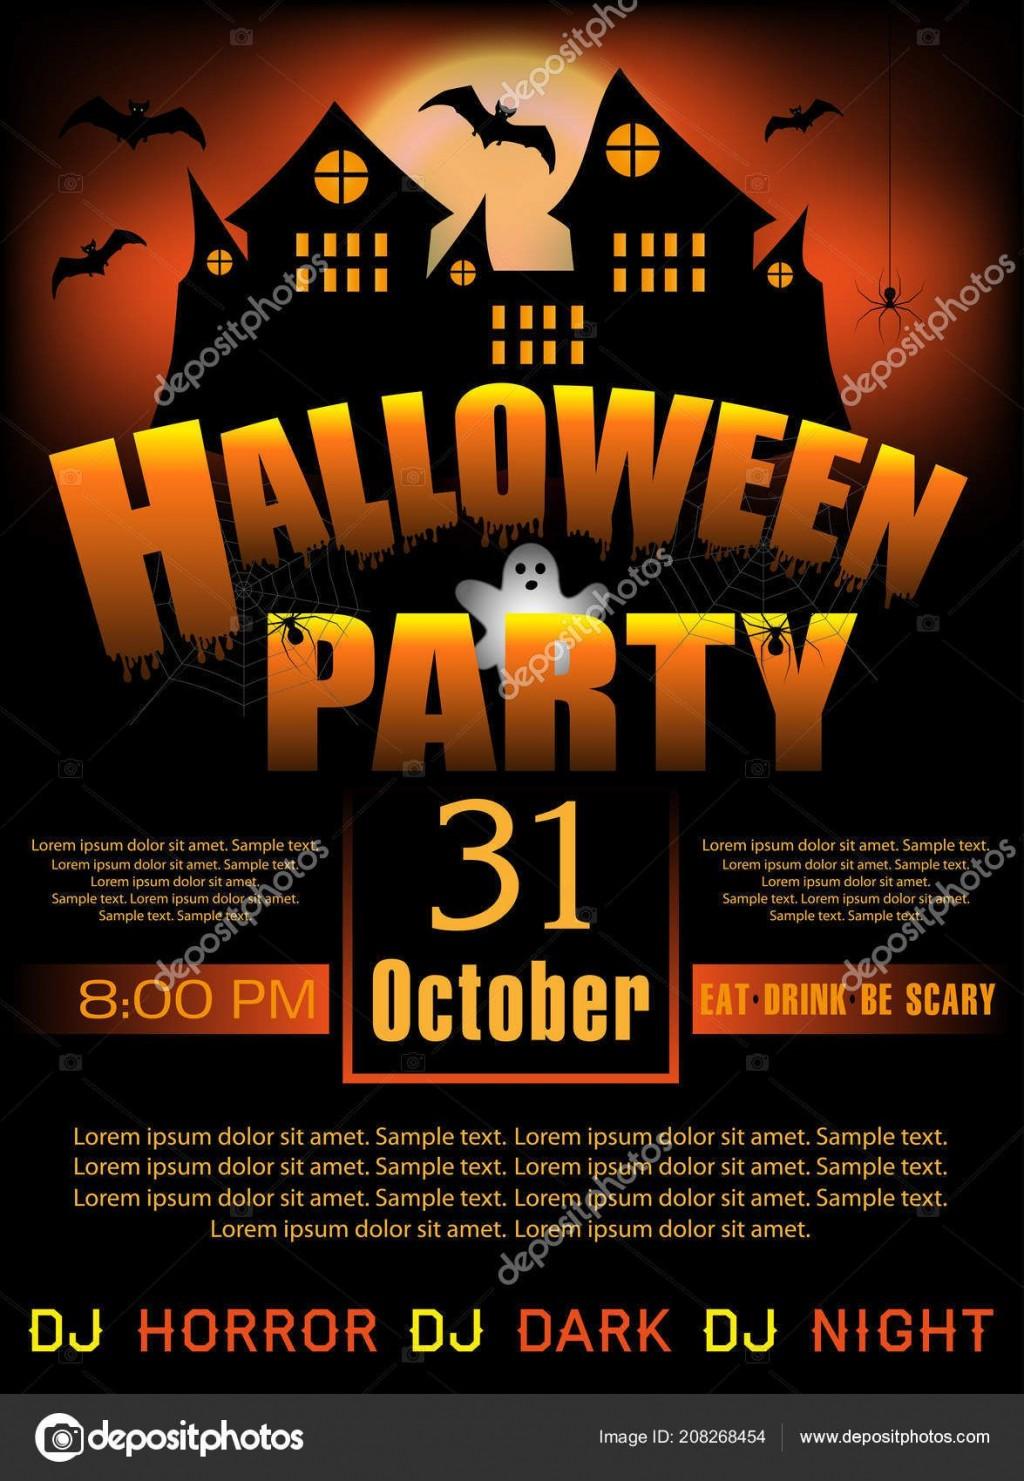 007 Shocking Halloween Party Invitation Template Image  Microsoft Block OctoberLarge